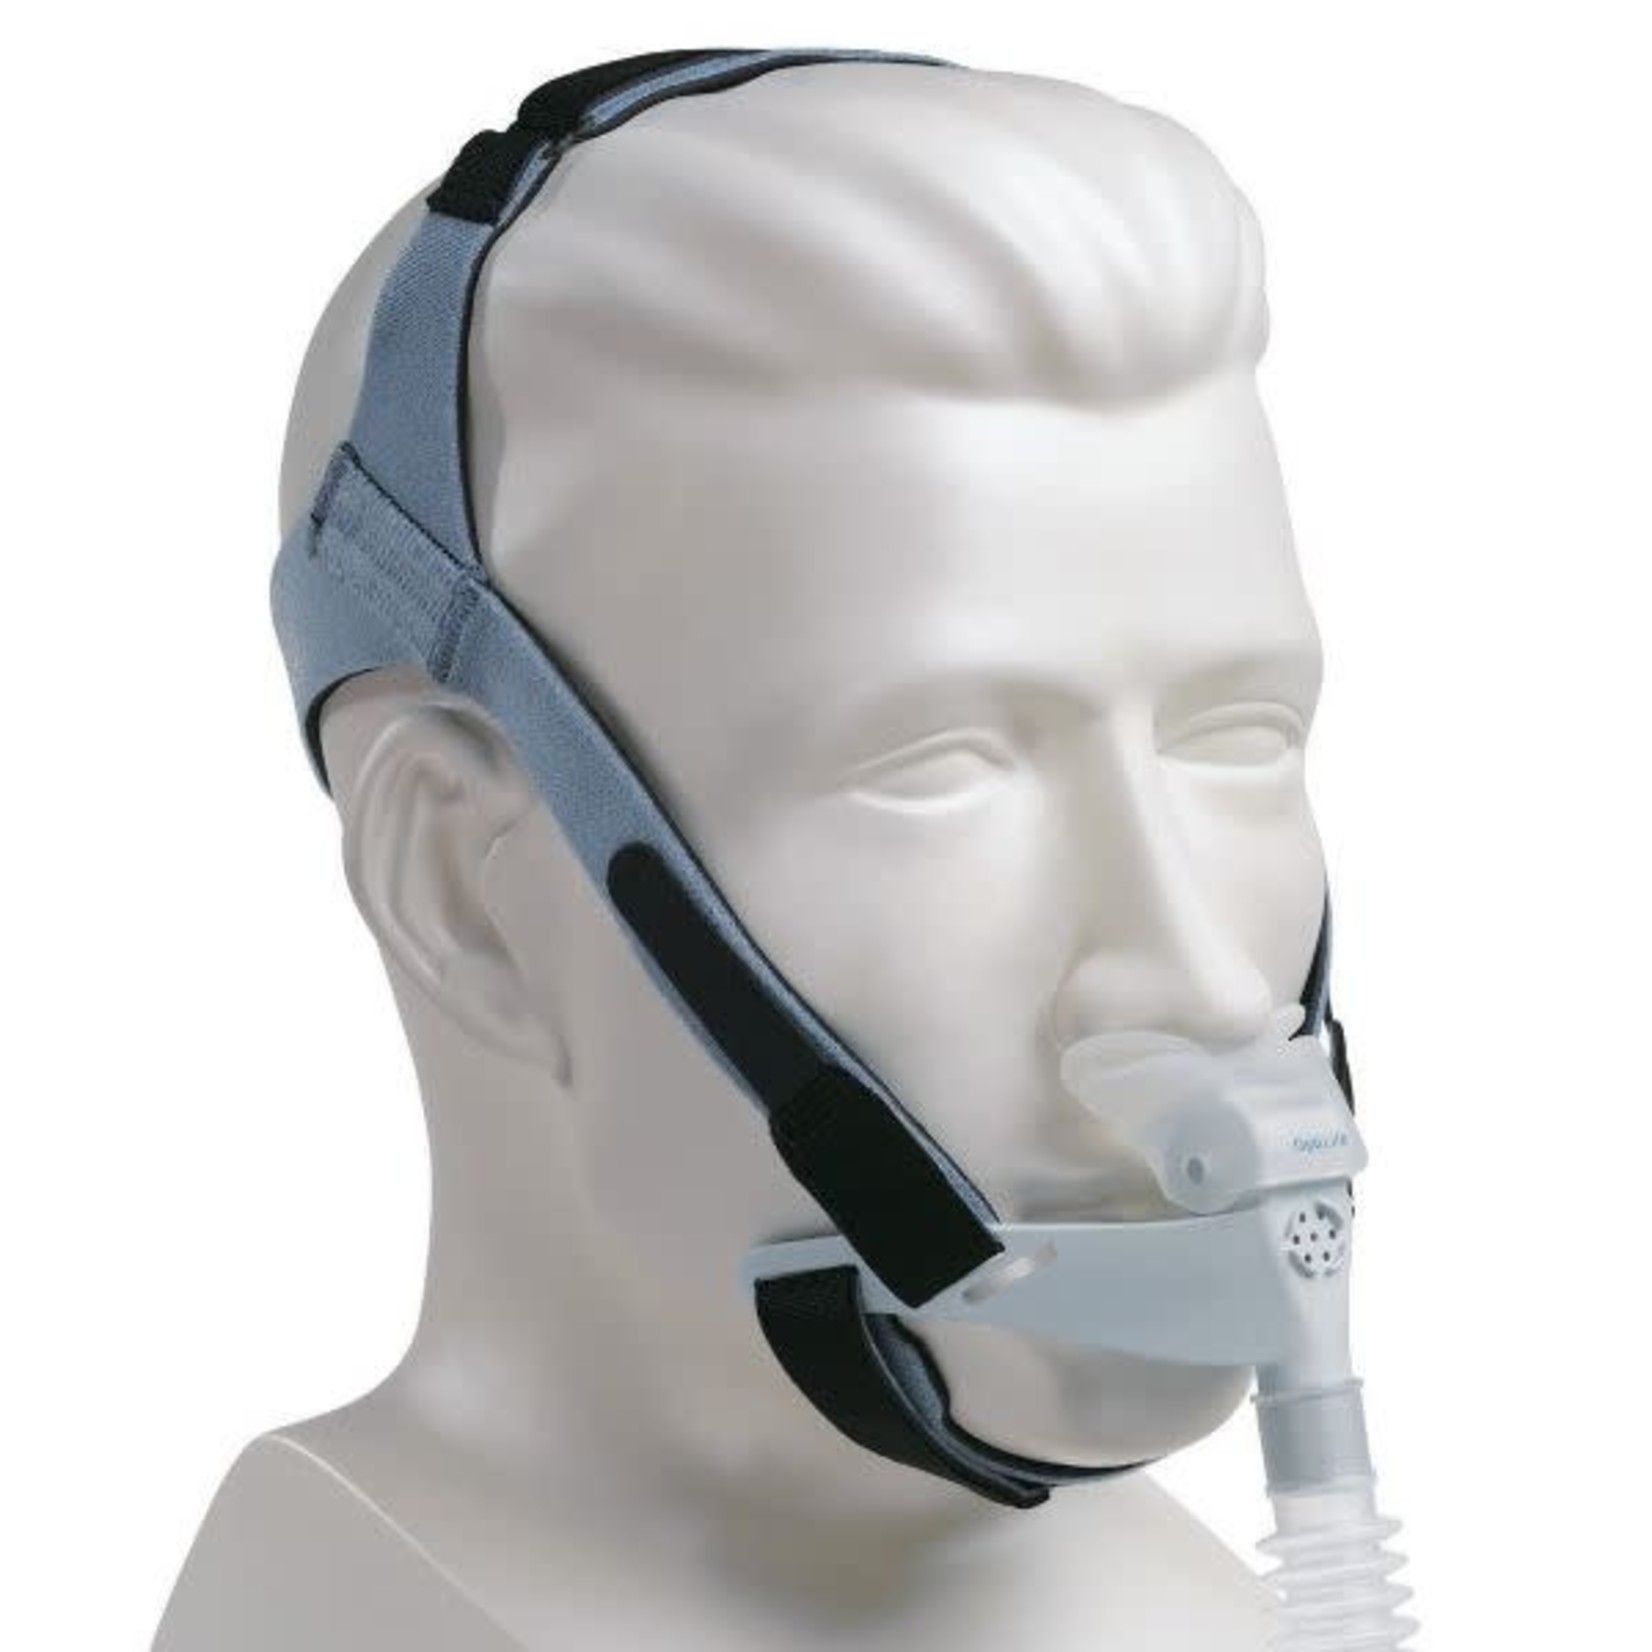 respironics optilife nasal pillow cpap mask w headgear